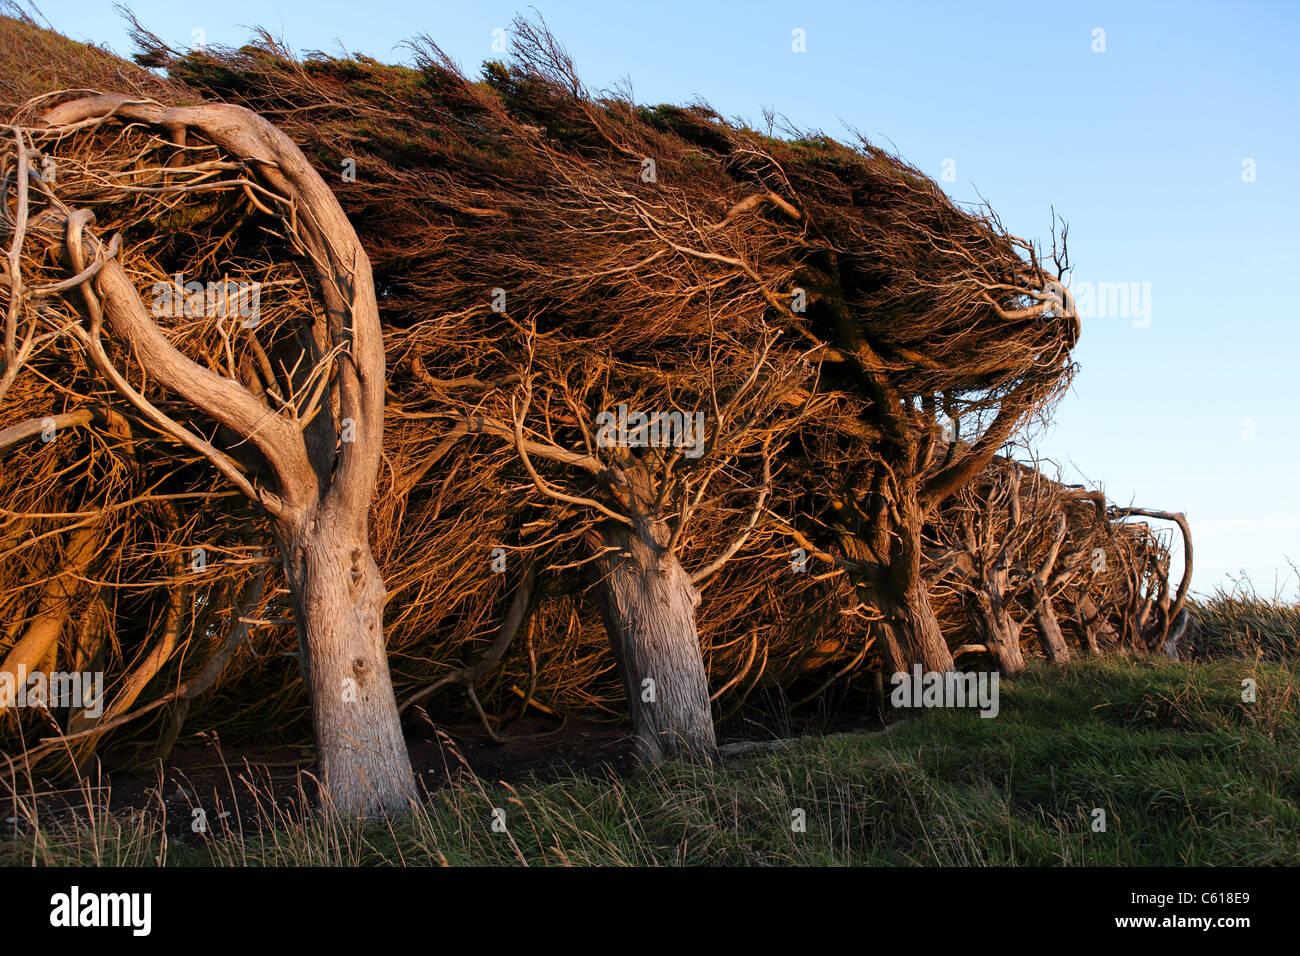 Wind Gnarled Stock Photos & Wind Gnarled Stock Images - Alamy